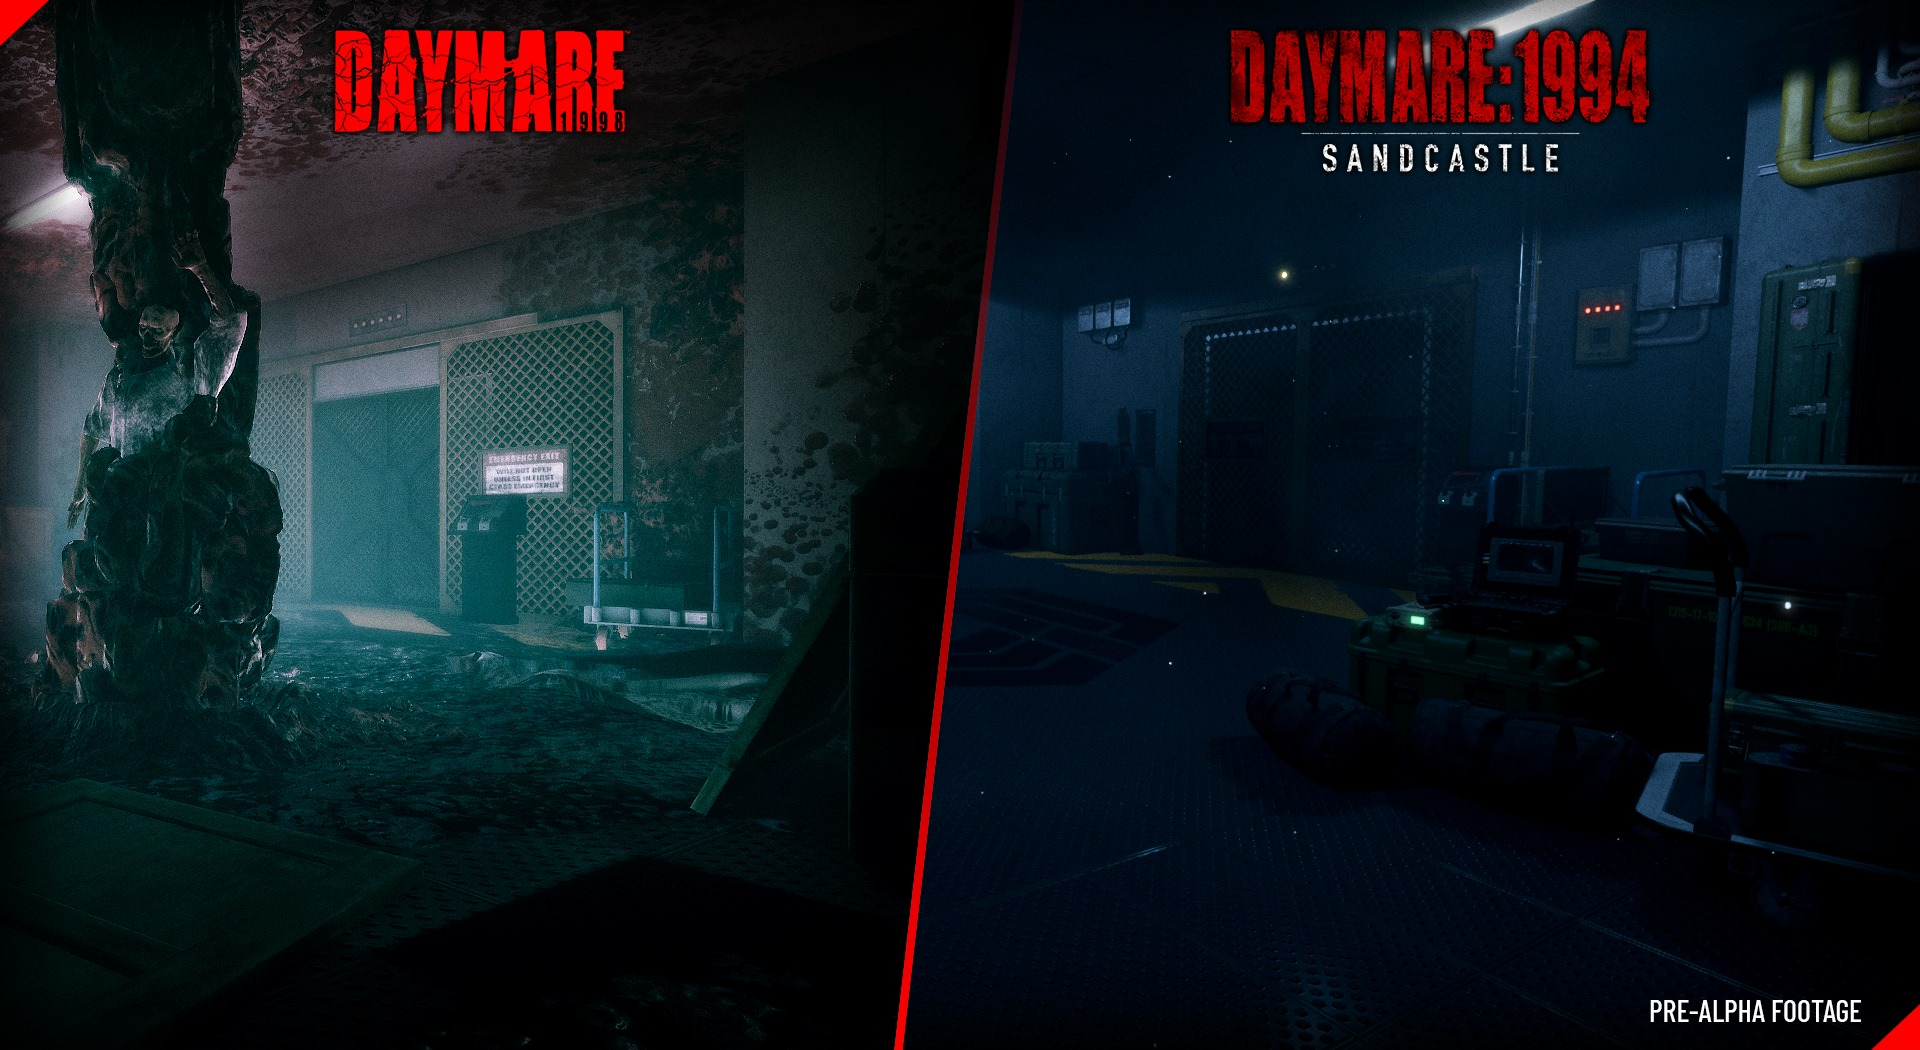 daymare 94 - daymare 98